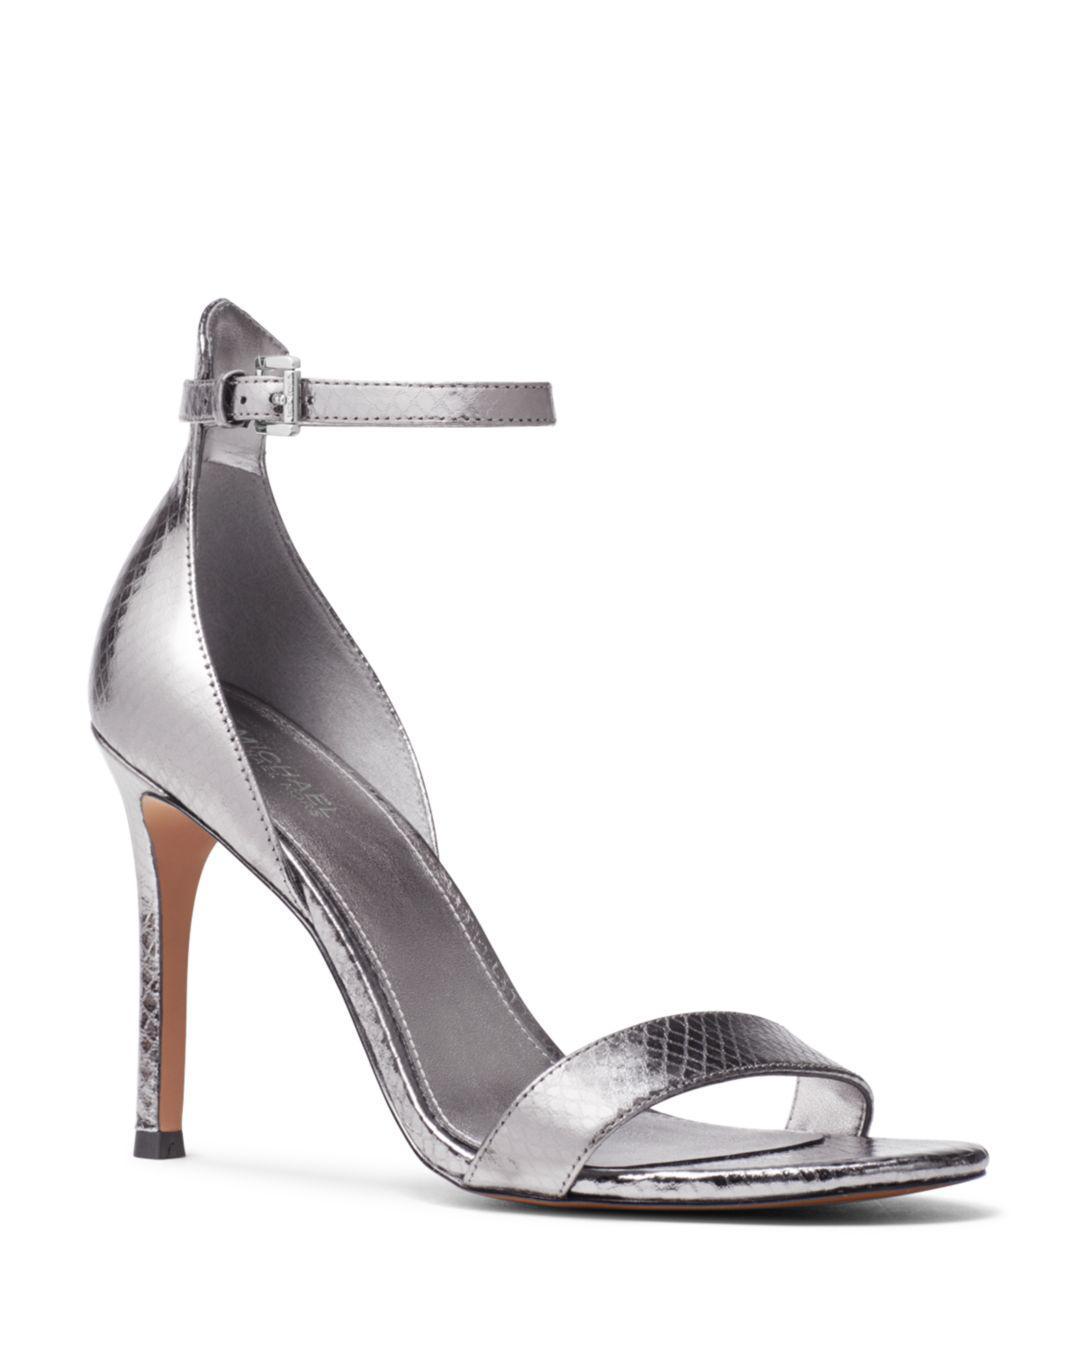 8fac6b9bb807 Lyst - MICHAEL Michael Kors Women s Harper High-heel Sandals in Metallic